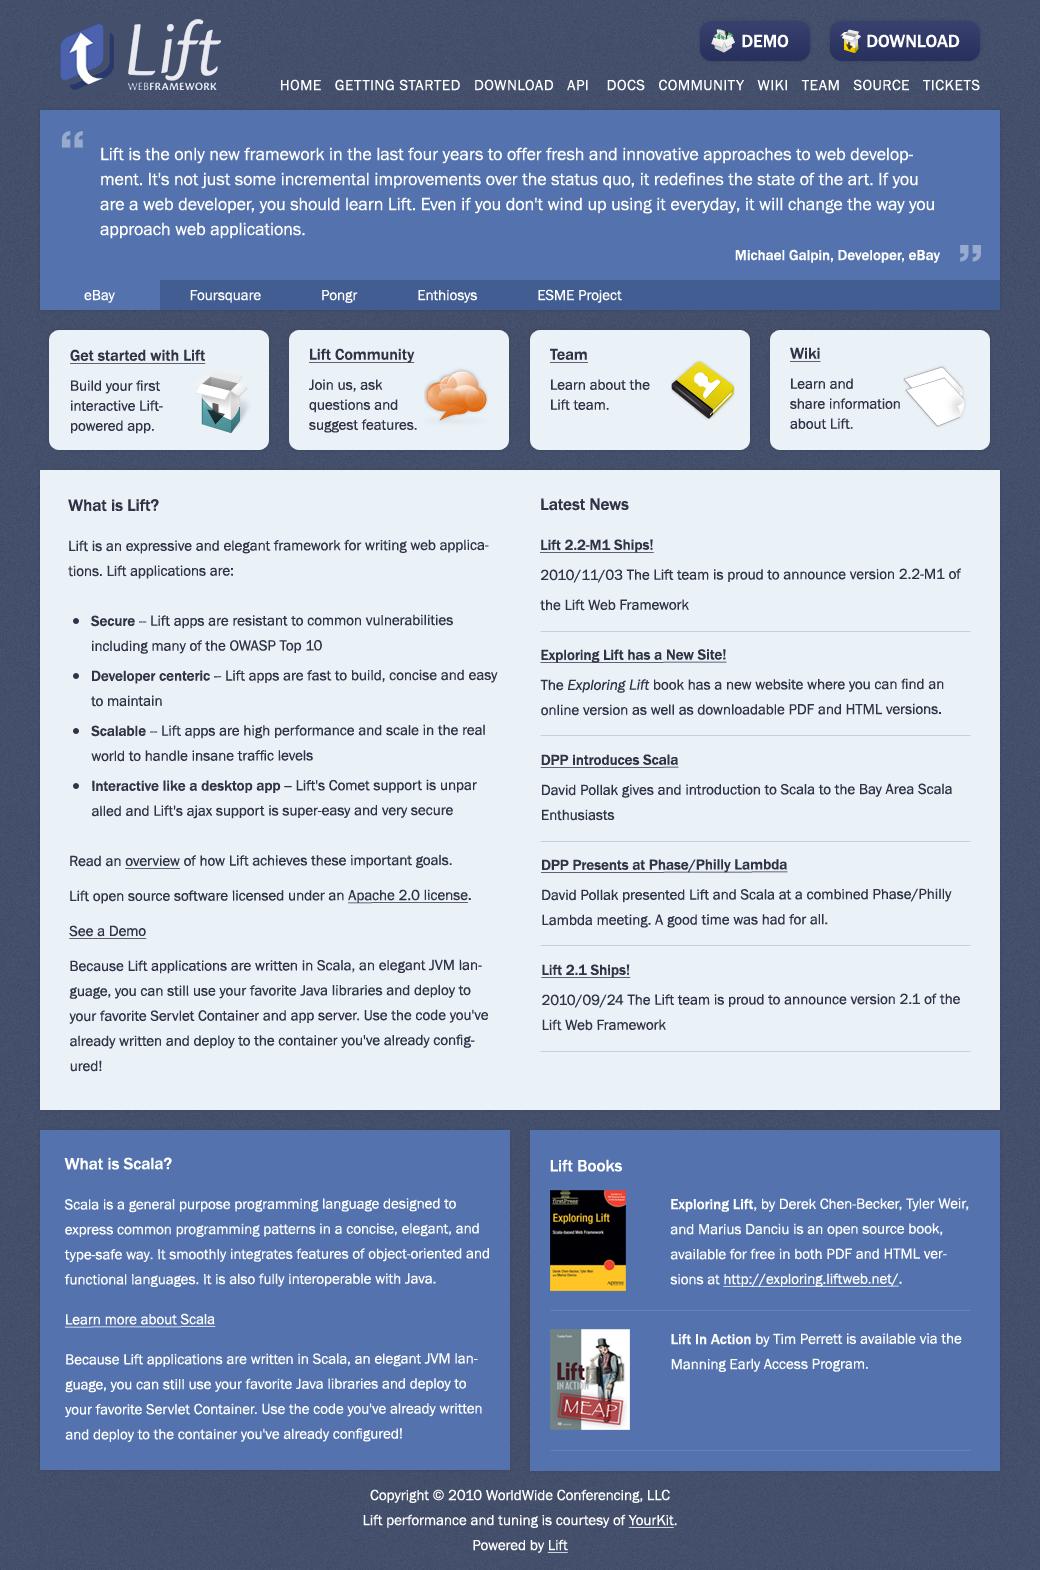 my redesign of liftweb.net